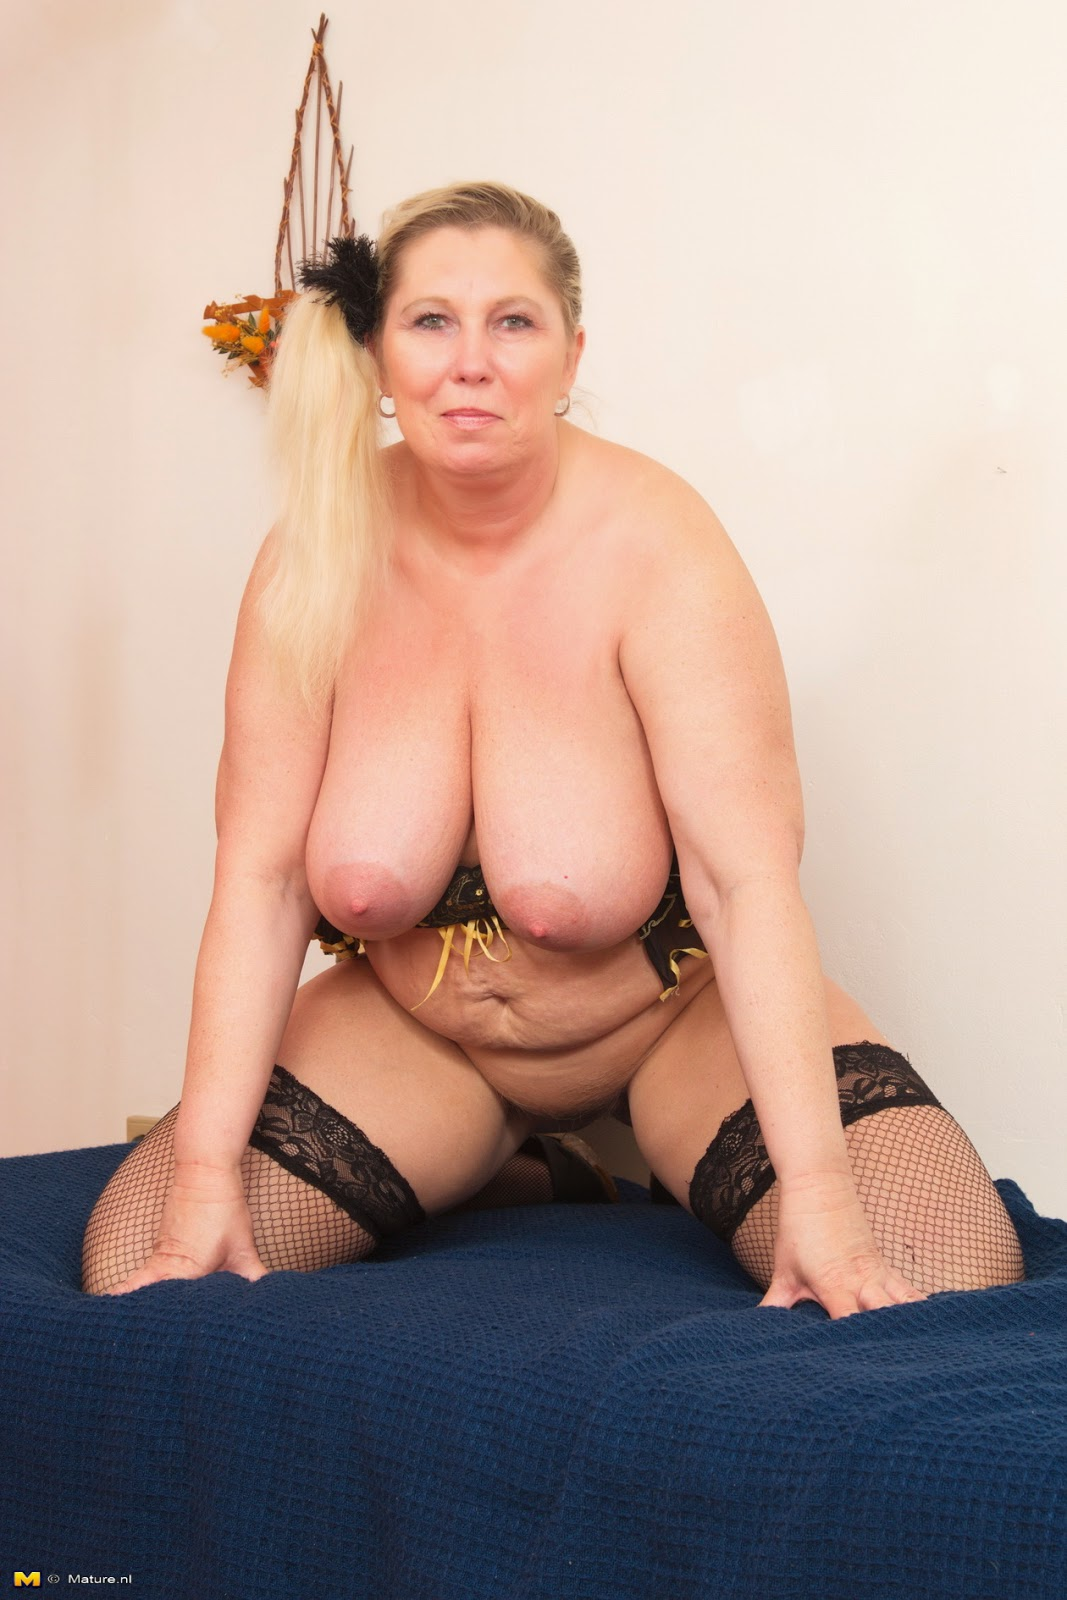 Autumn raby nude video